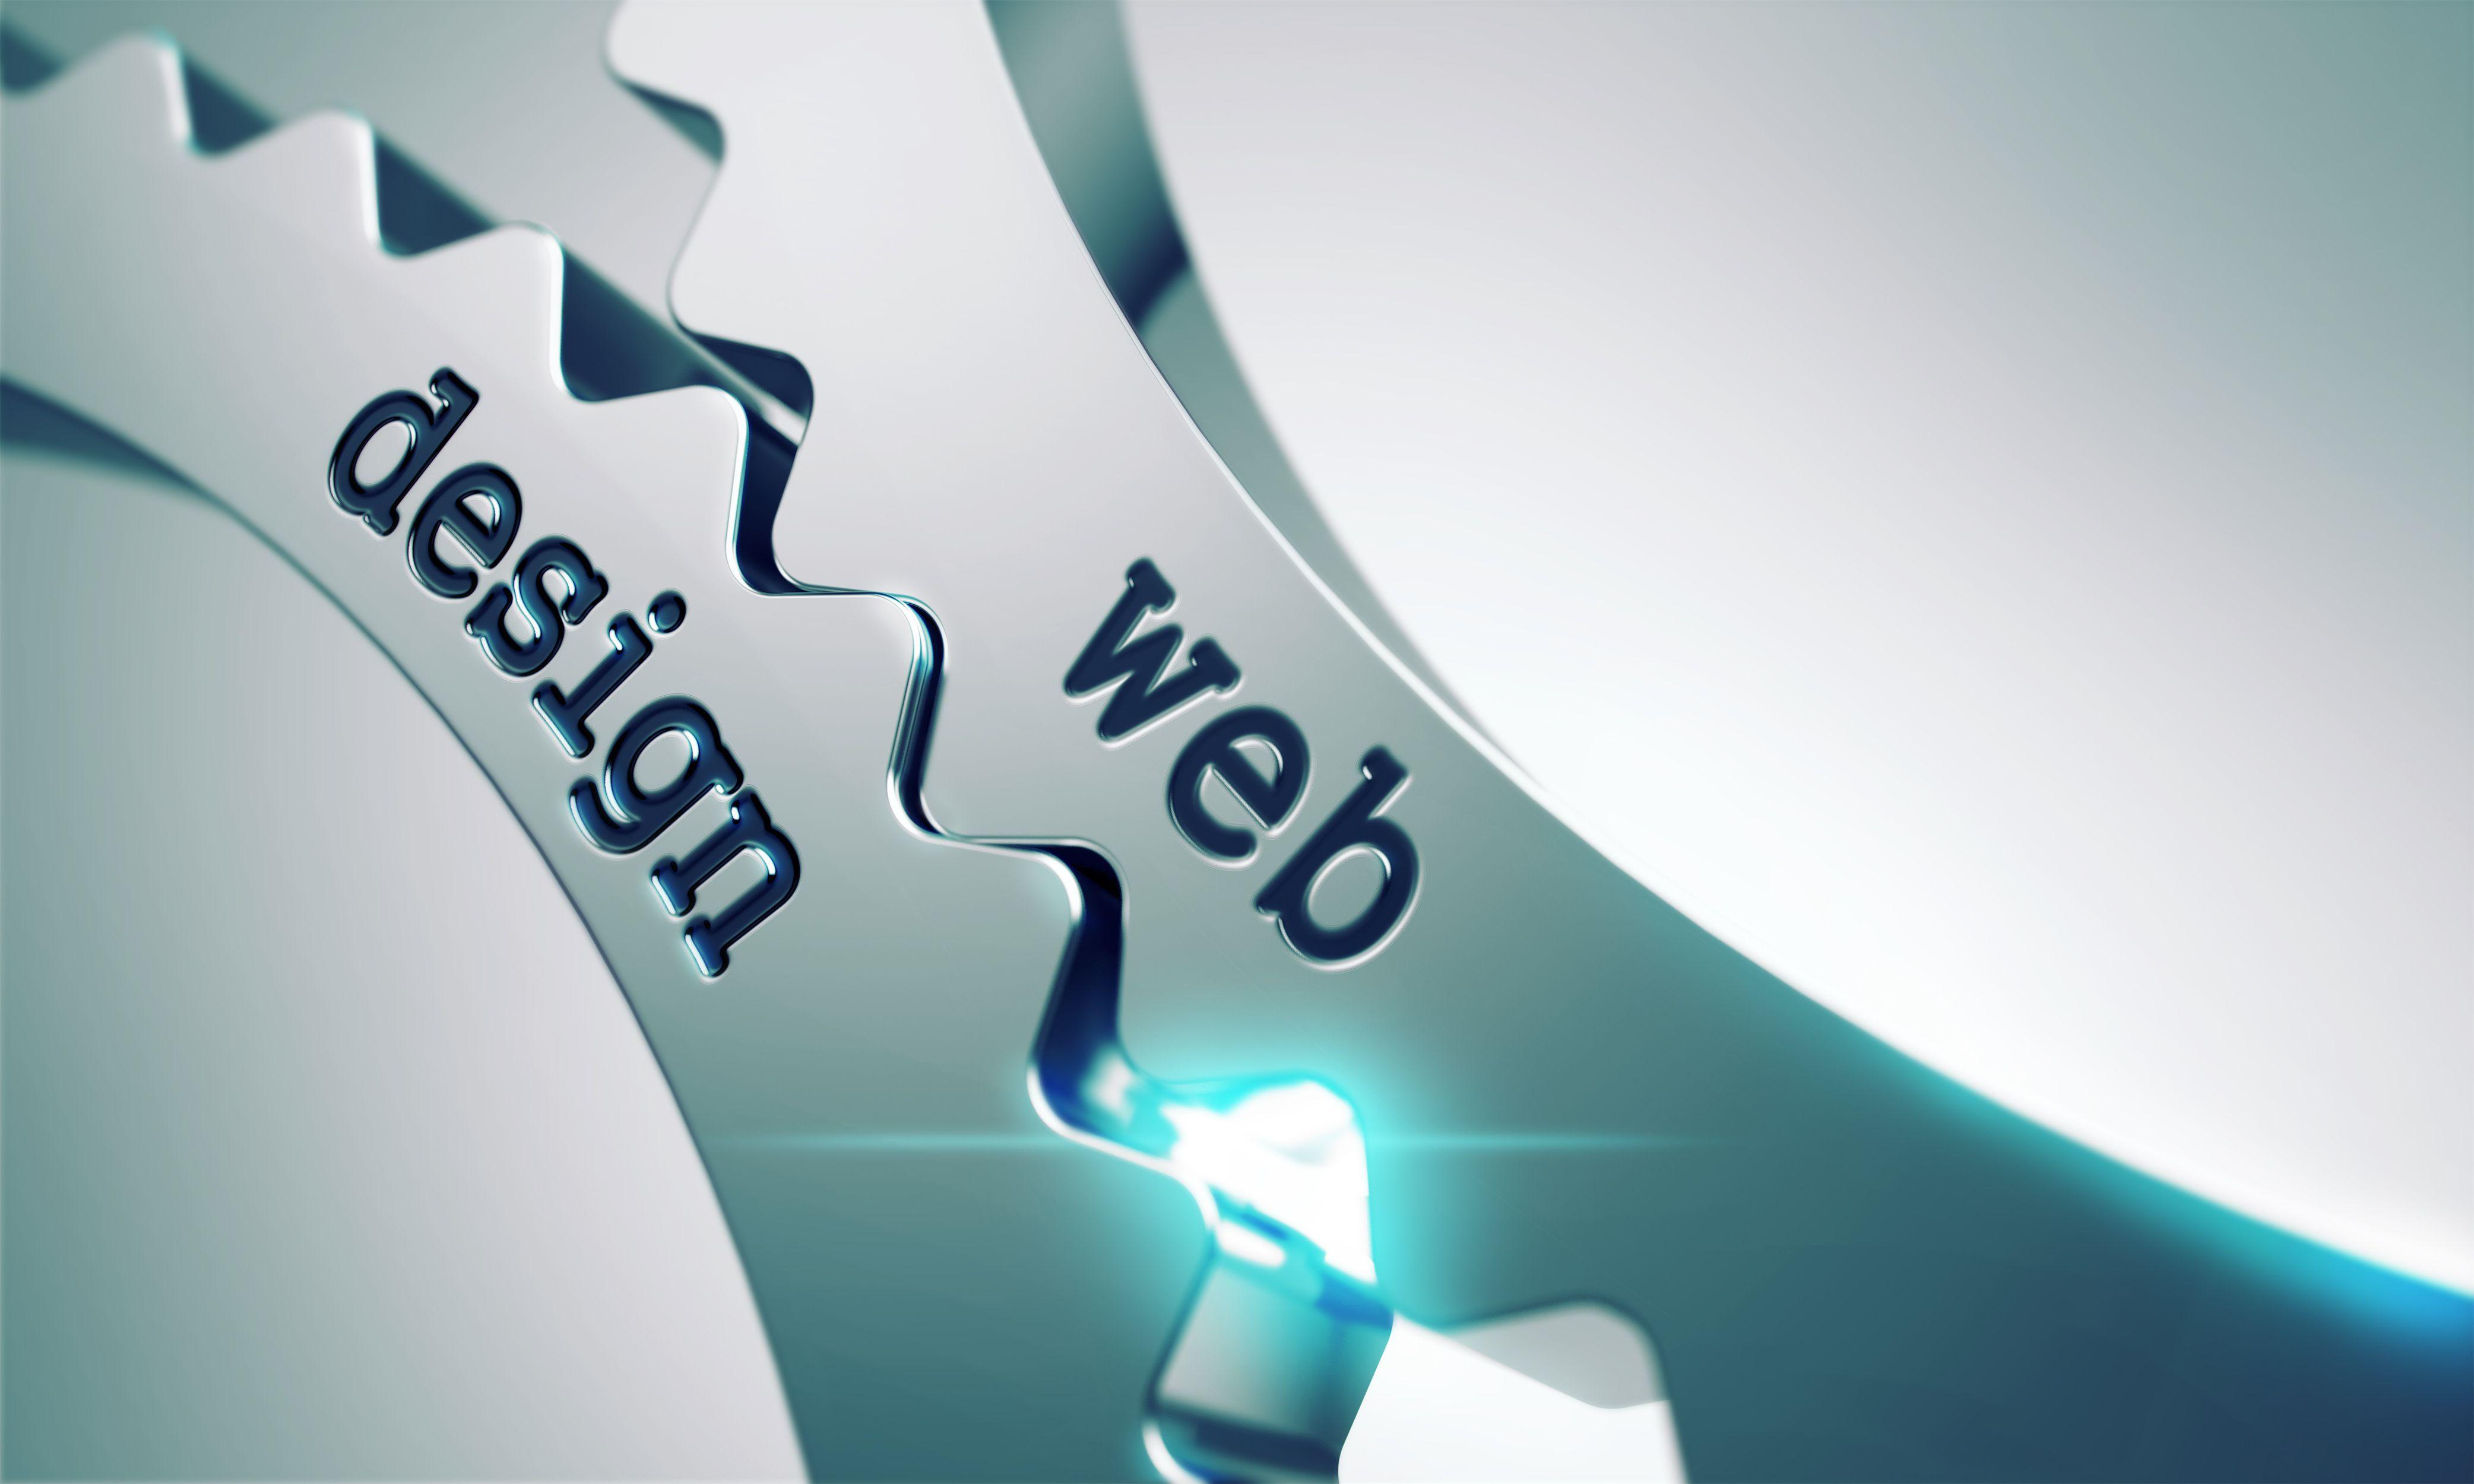 Web Designer Mean Web Design Company Website Design Company Website Design Services